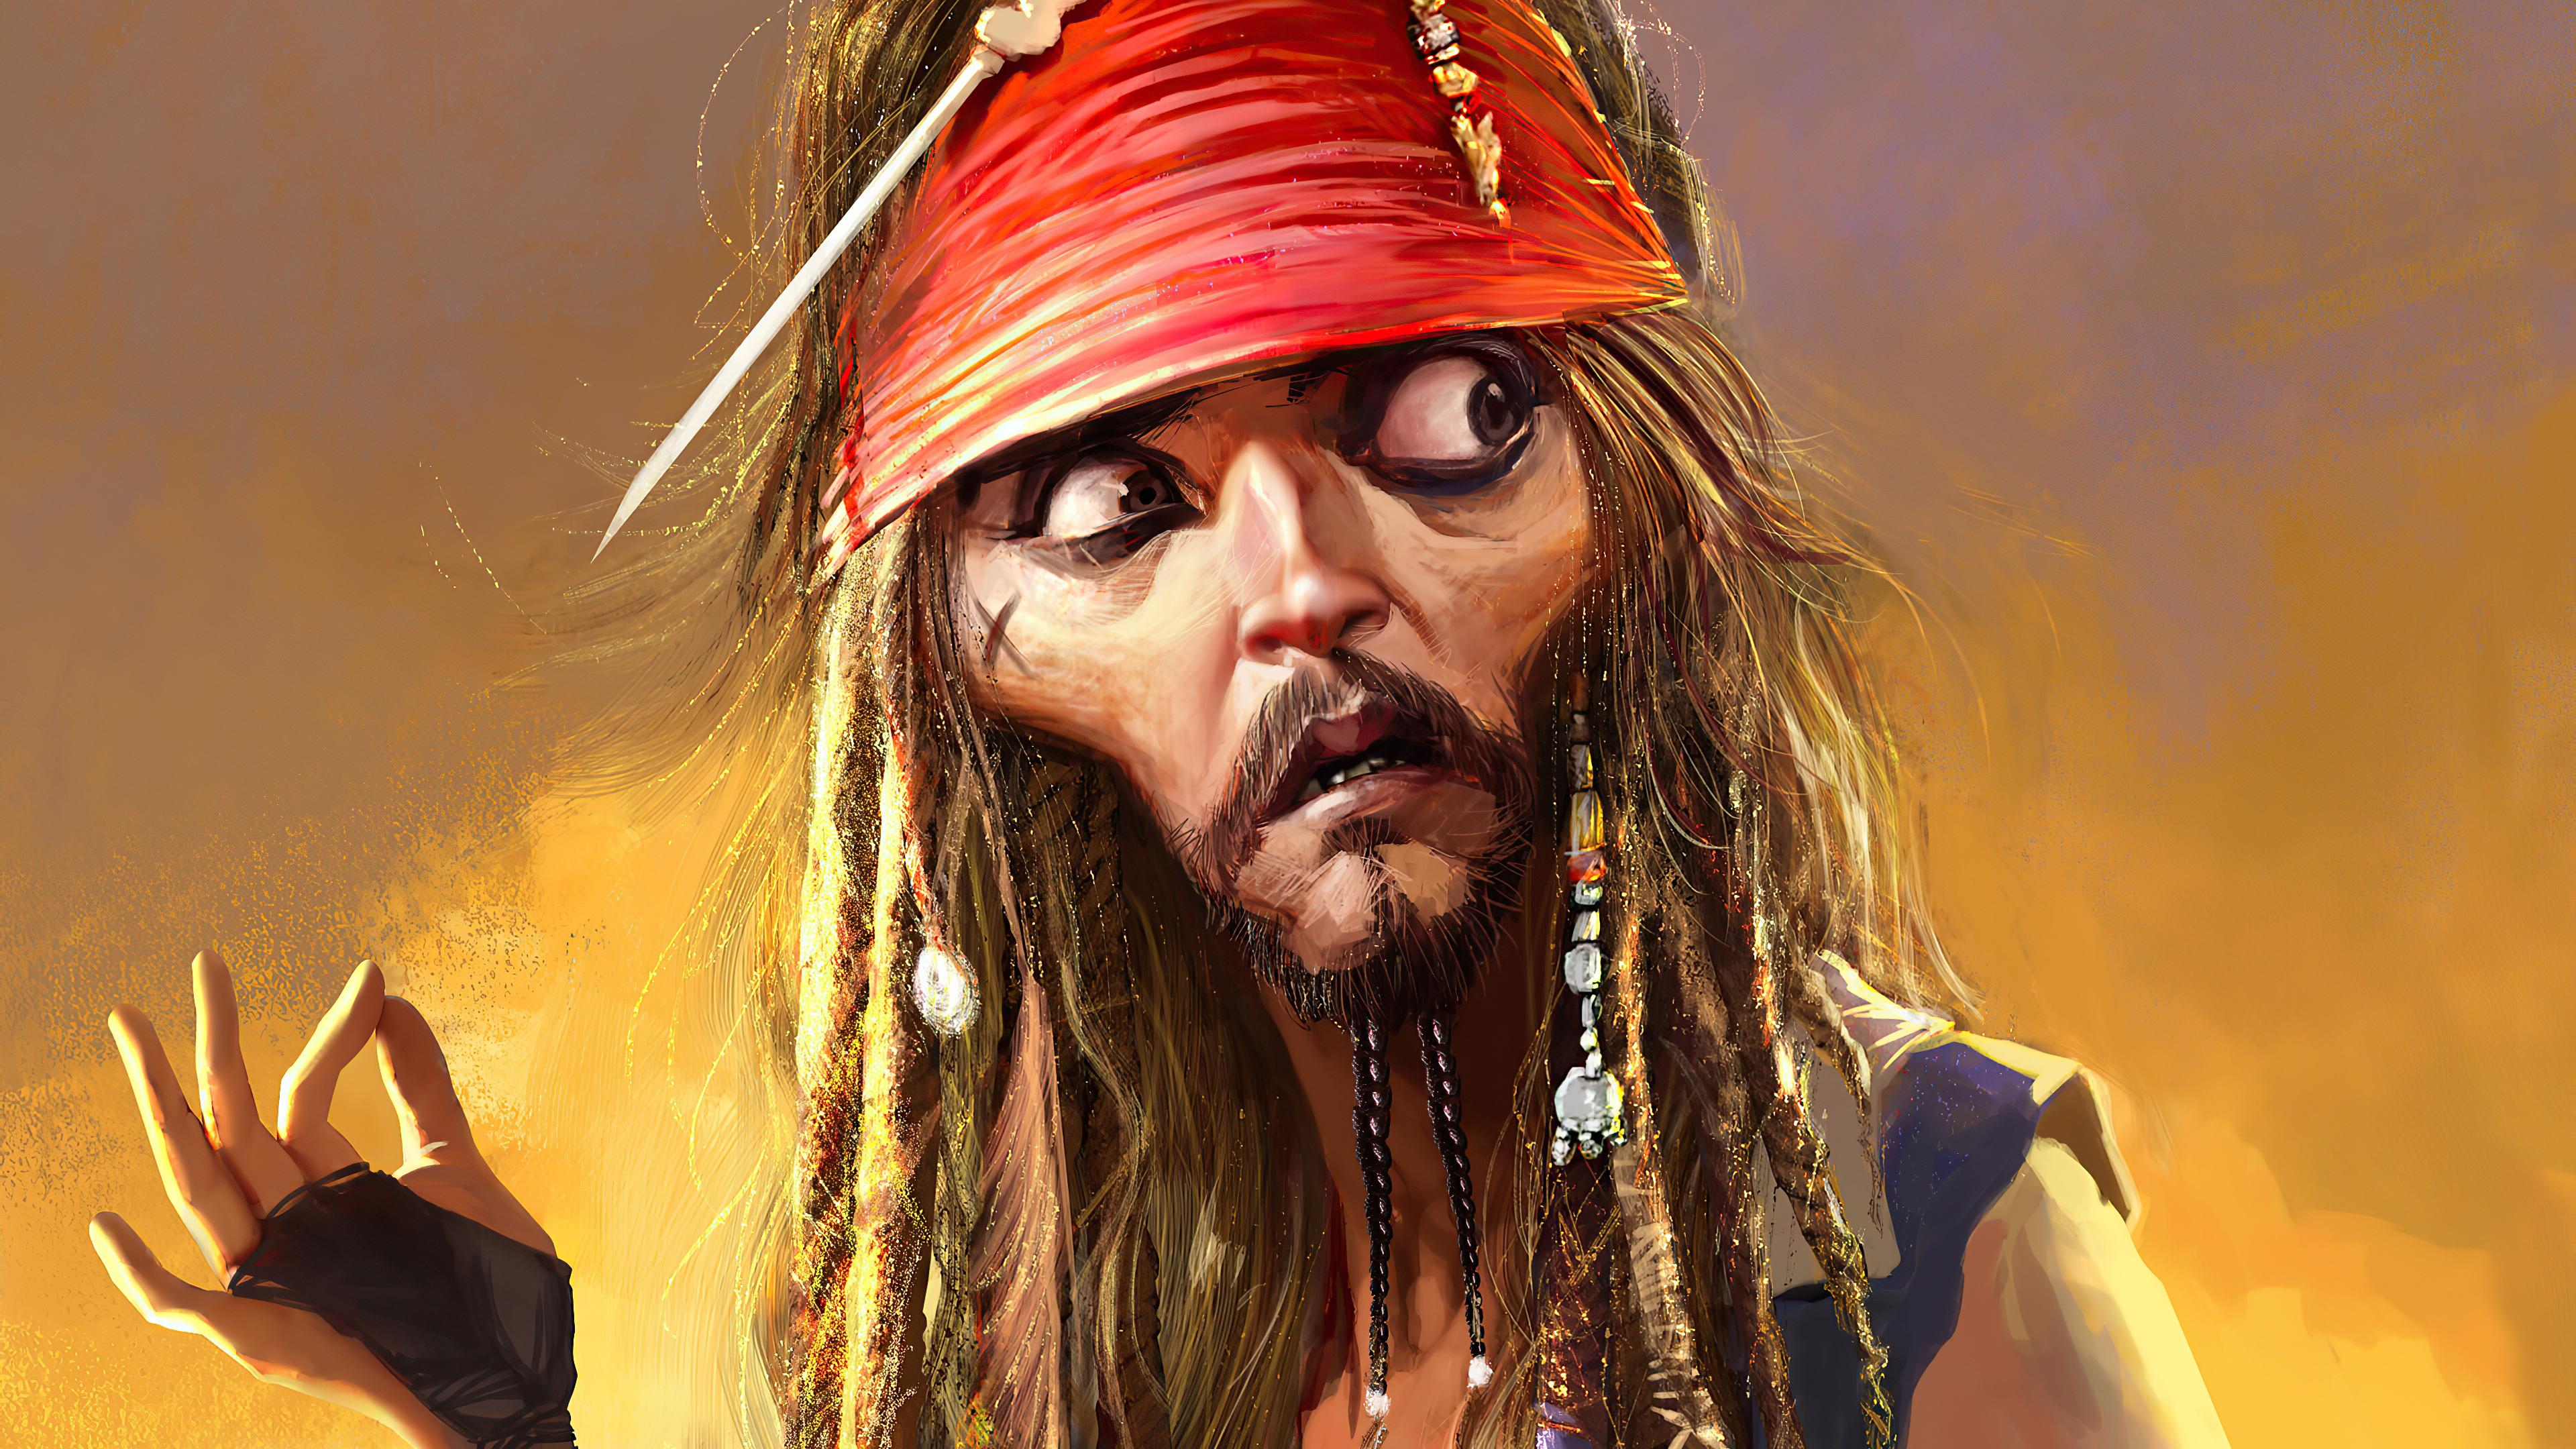 jack sparrow 4k 1602435177 - Jack Sparrow 4k - Jack Sparrow 4k wallpapers